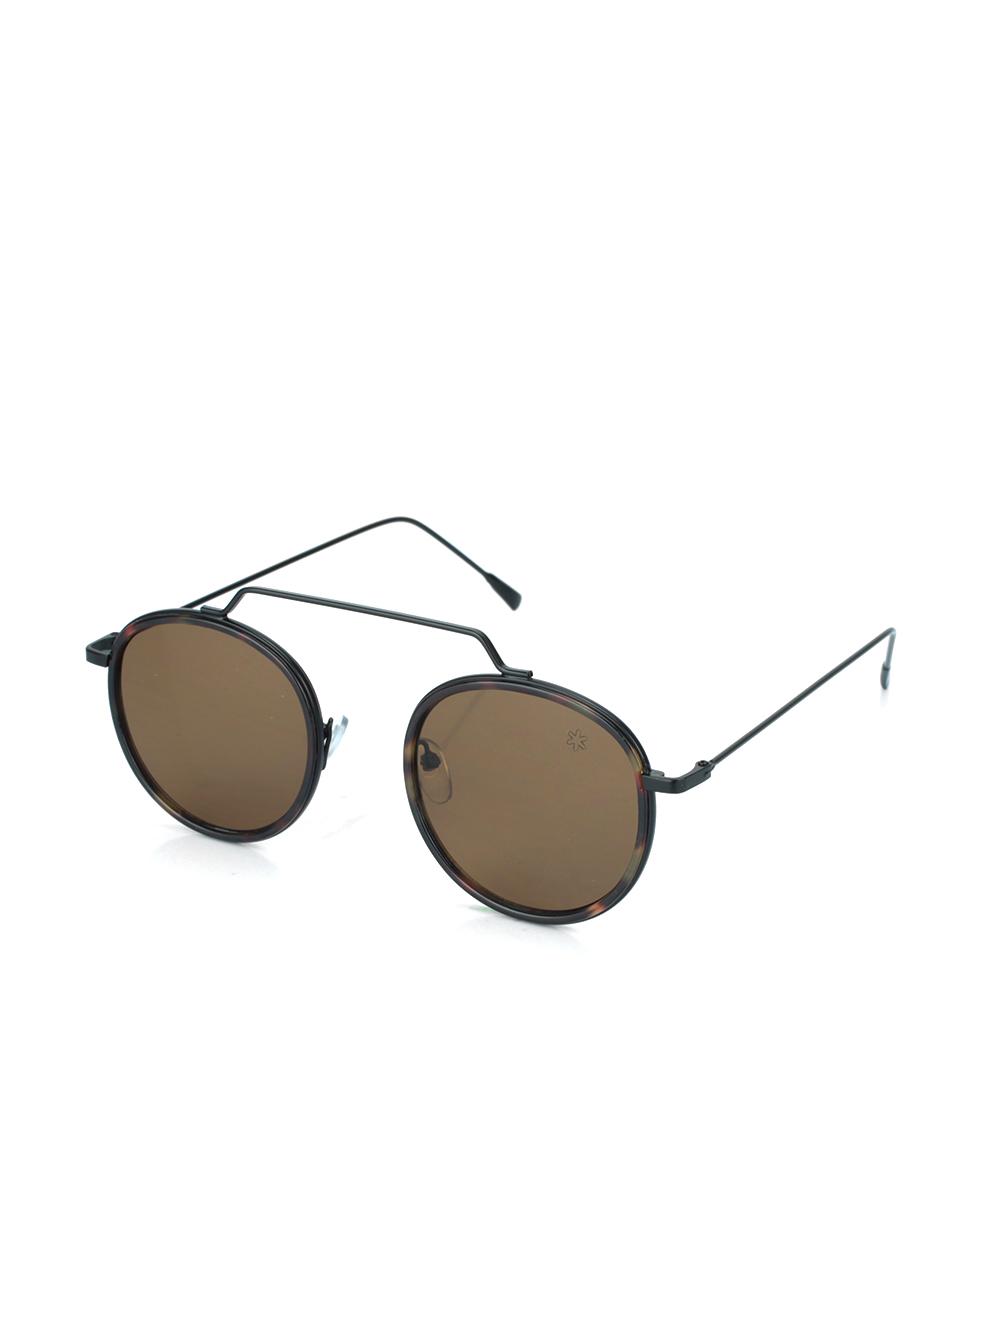 Sunglasses Ivy Marrom